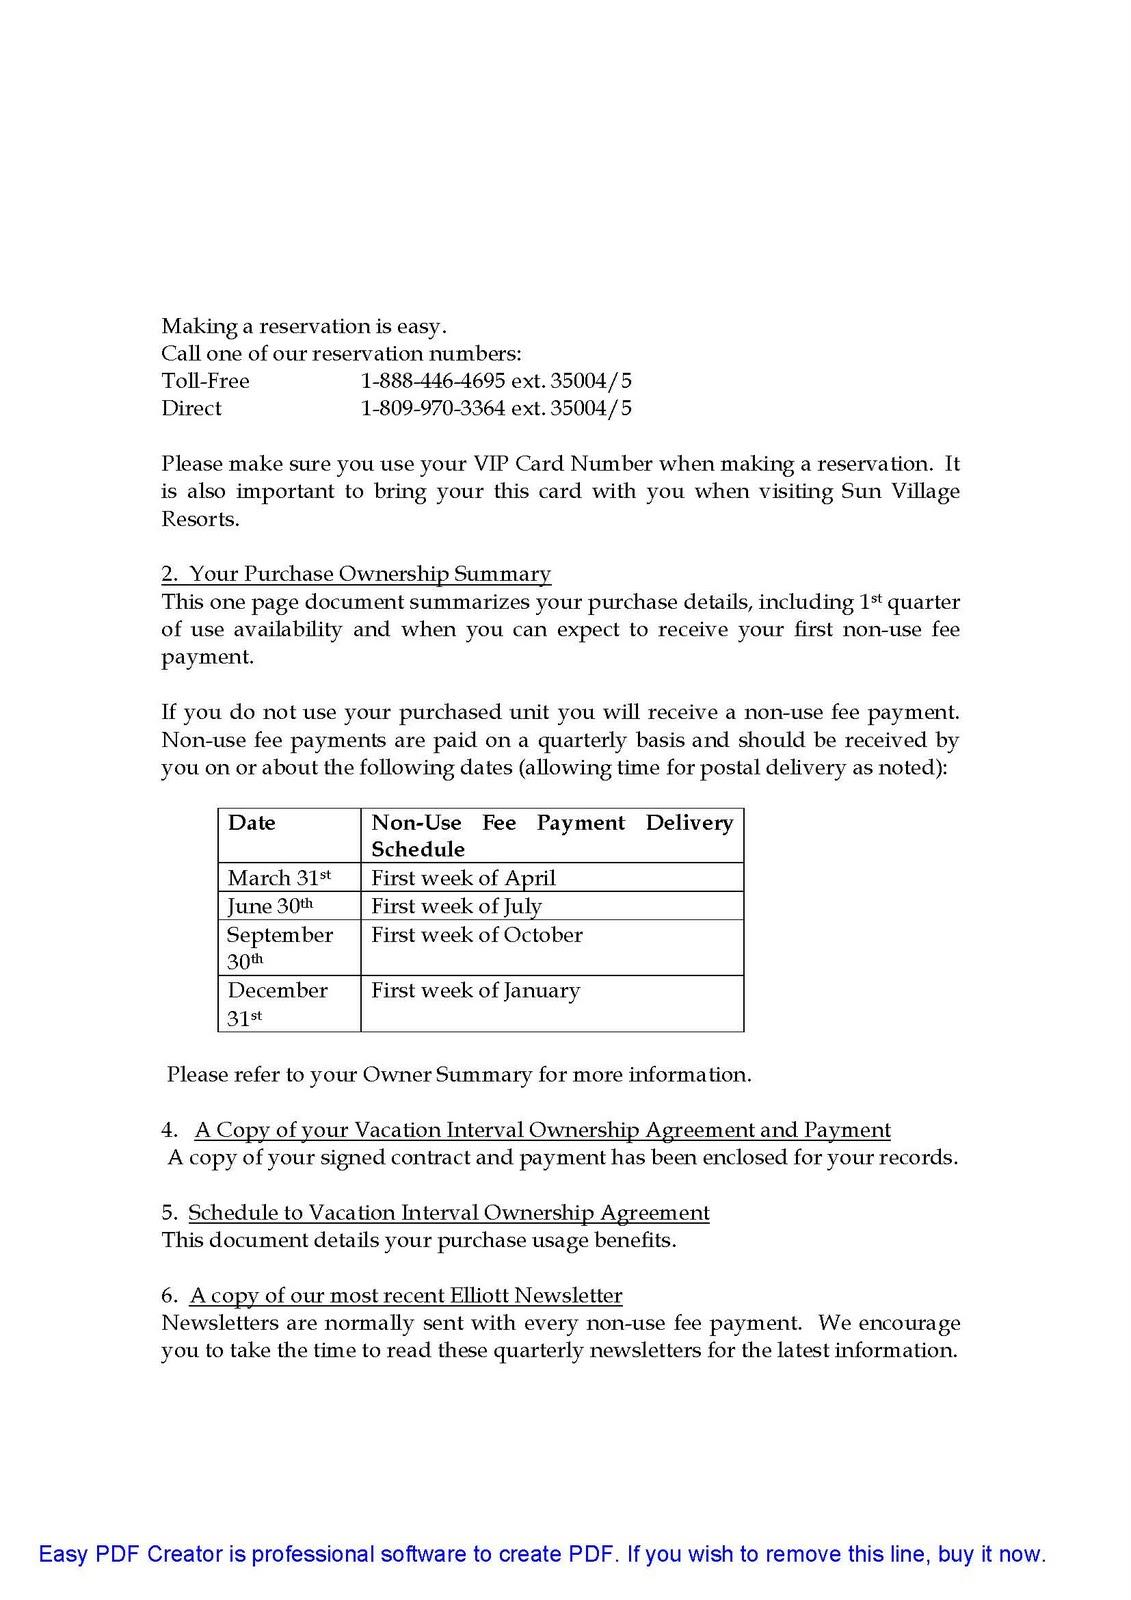 sun village facts may 2011